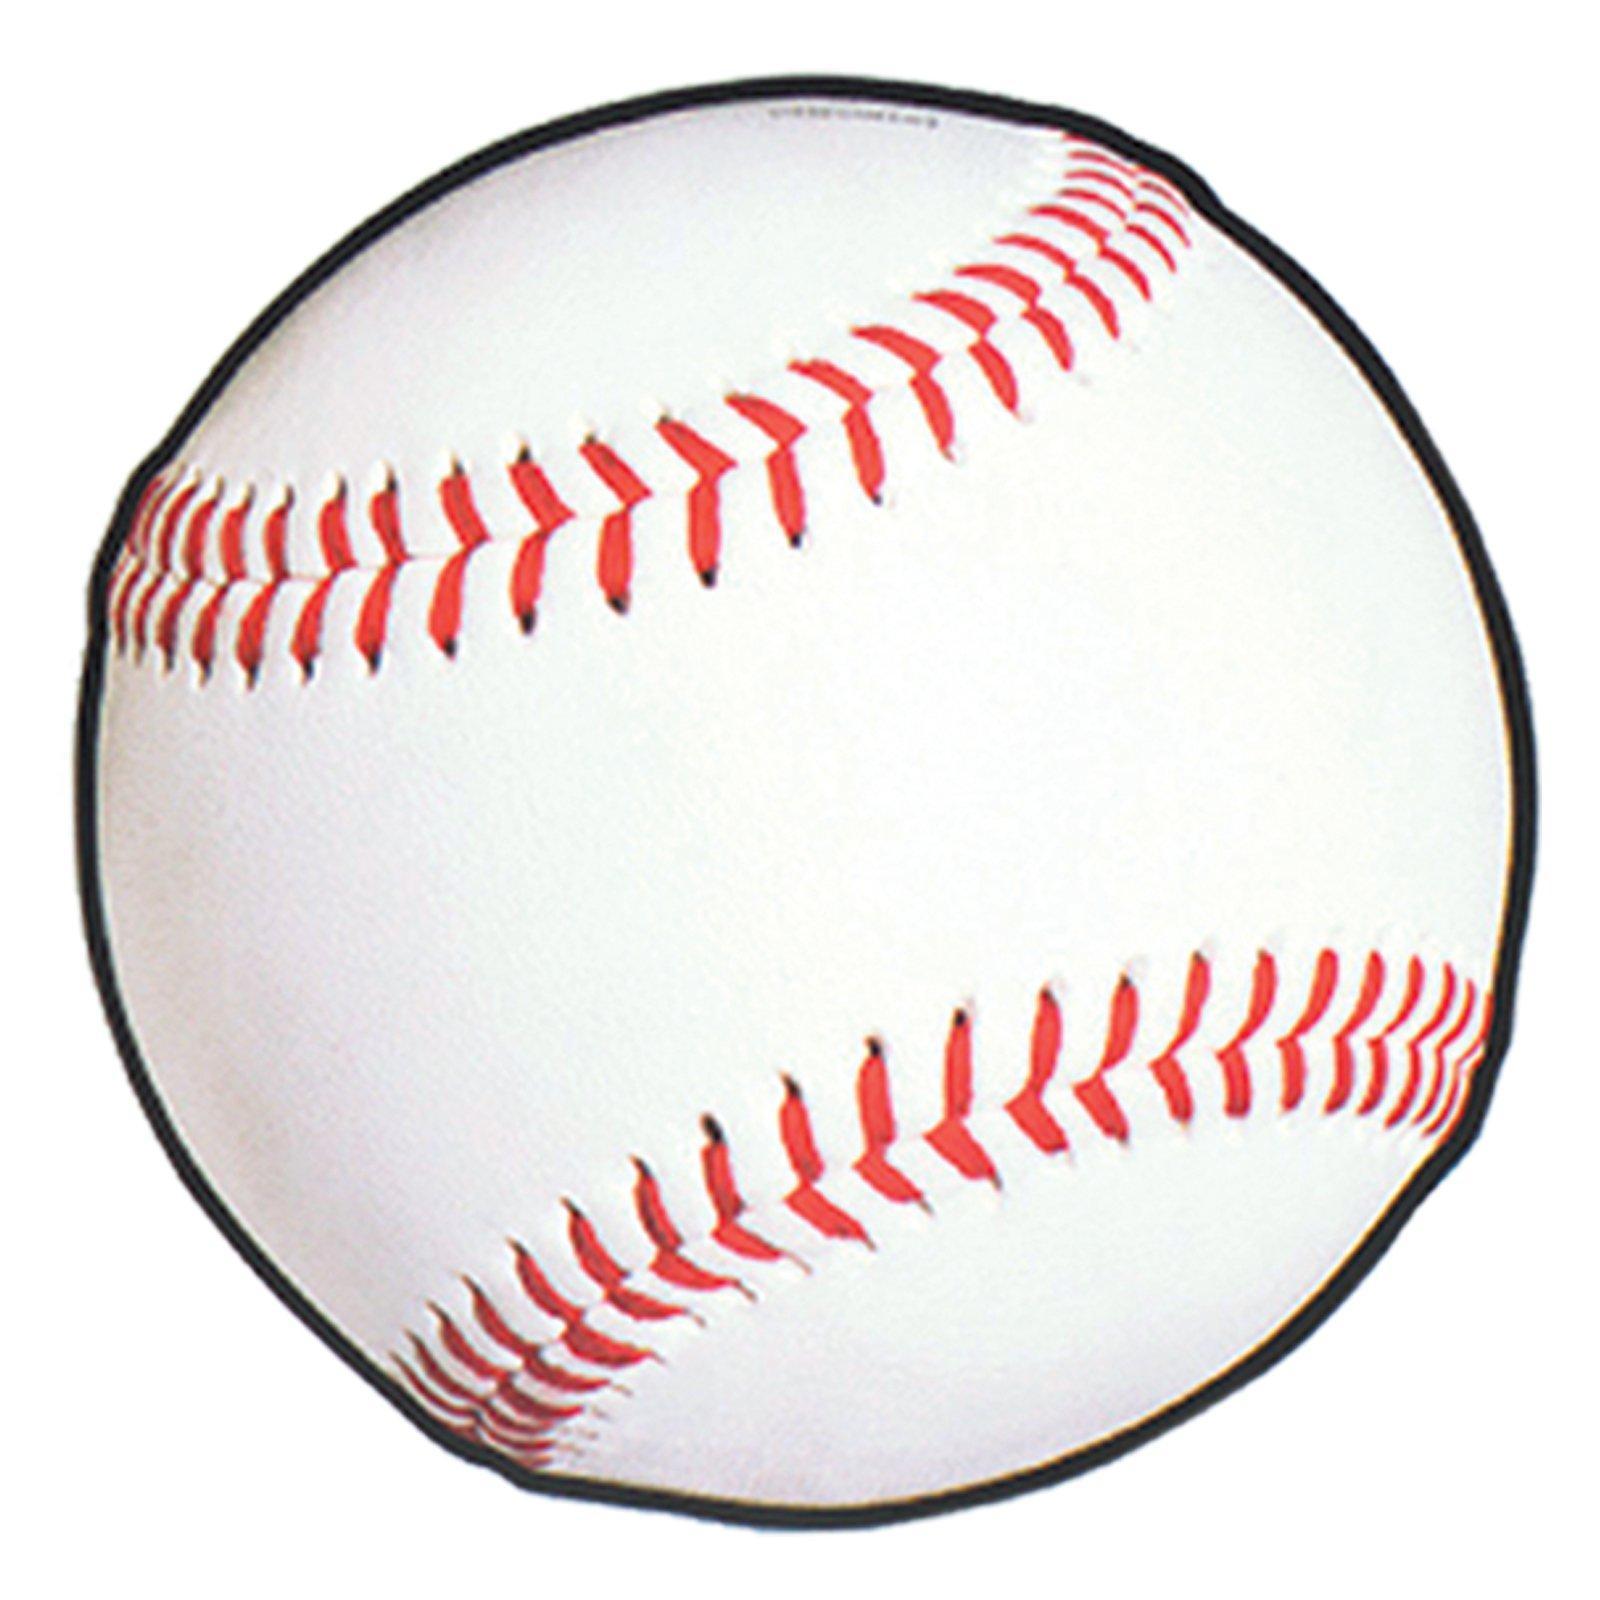 Baseball clipart Clip art clipart images clipart